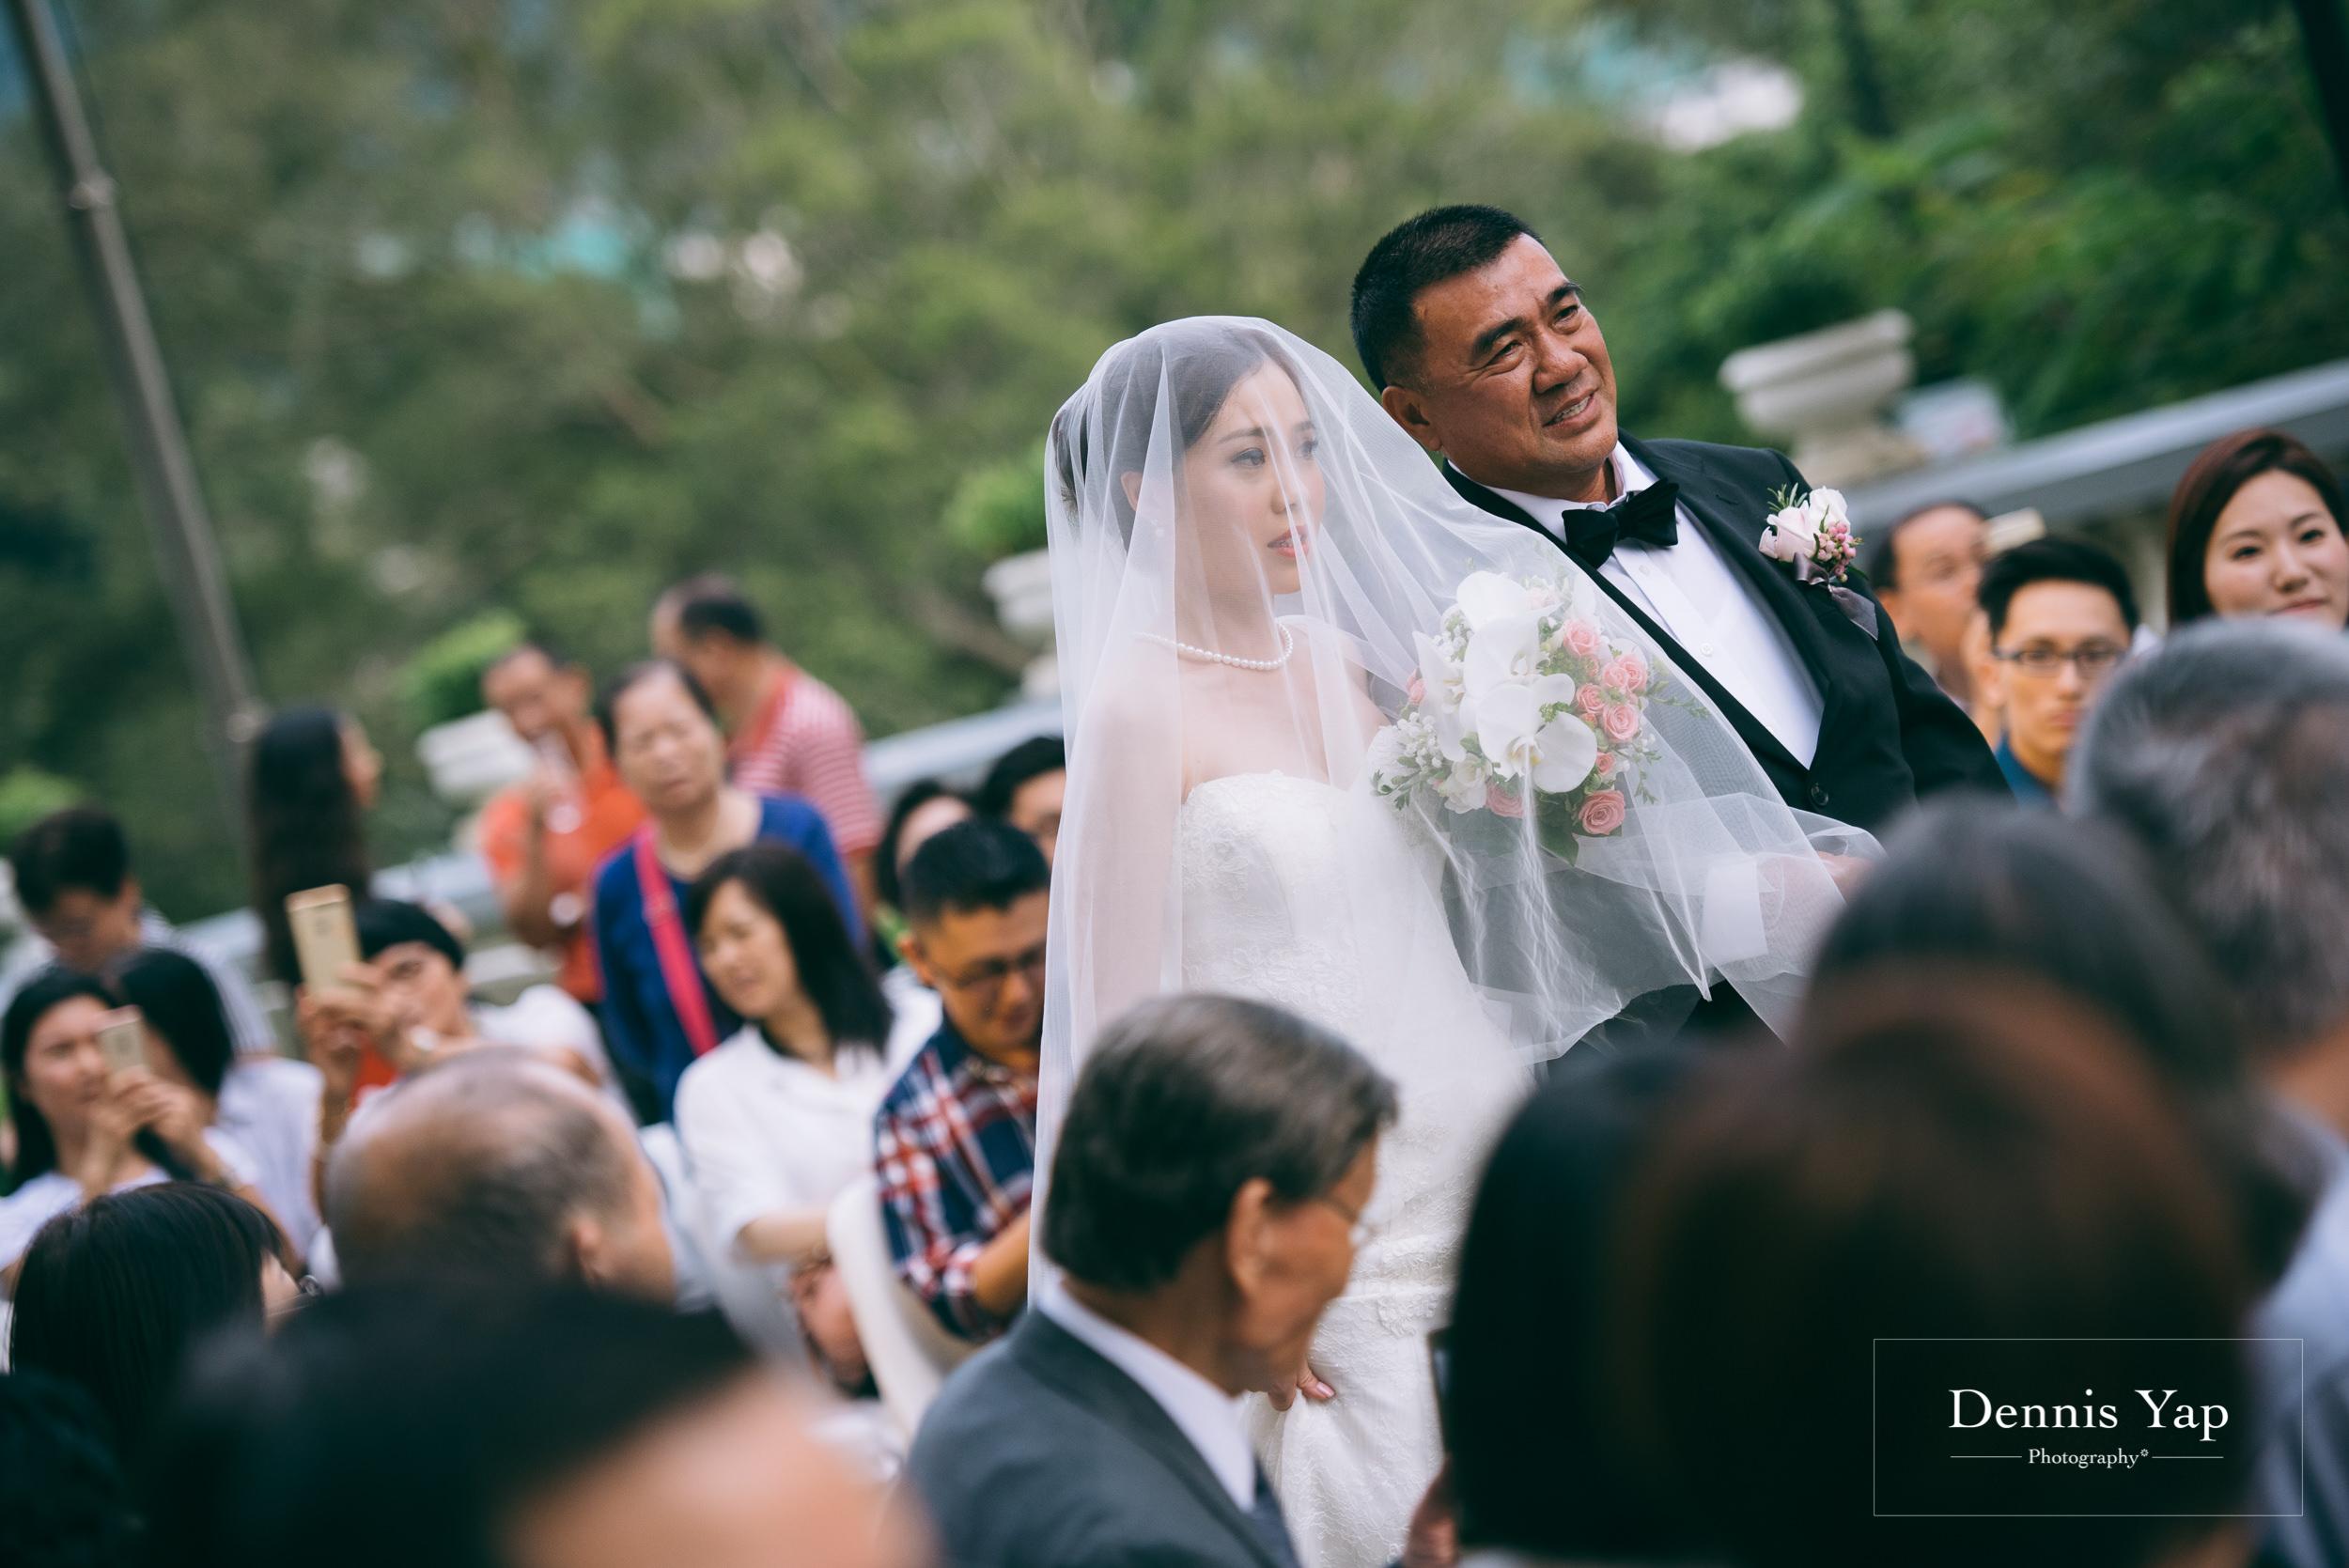 jason crystal wedding day gate crash hong kong garden wedding dennis yap photography-26.jpg